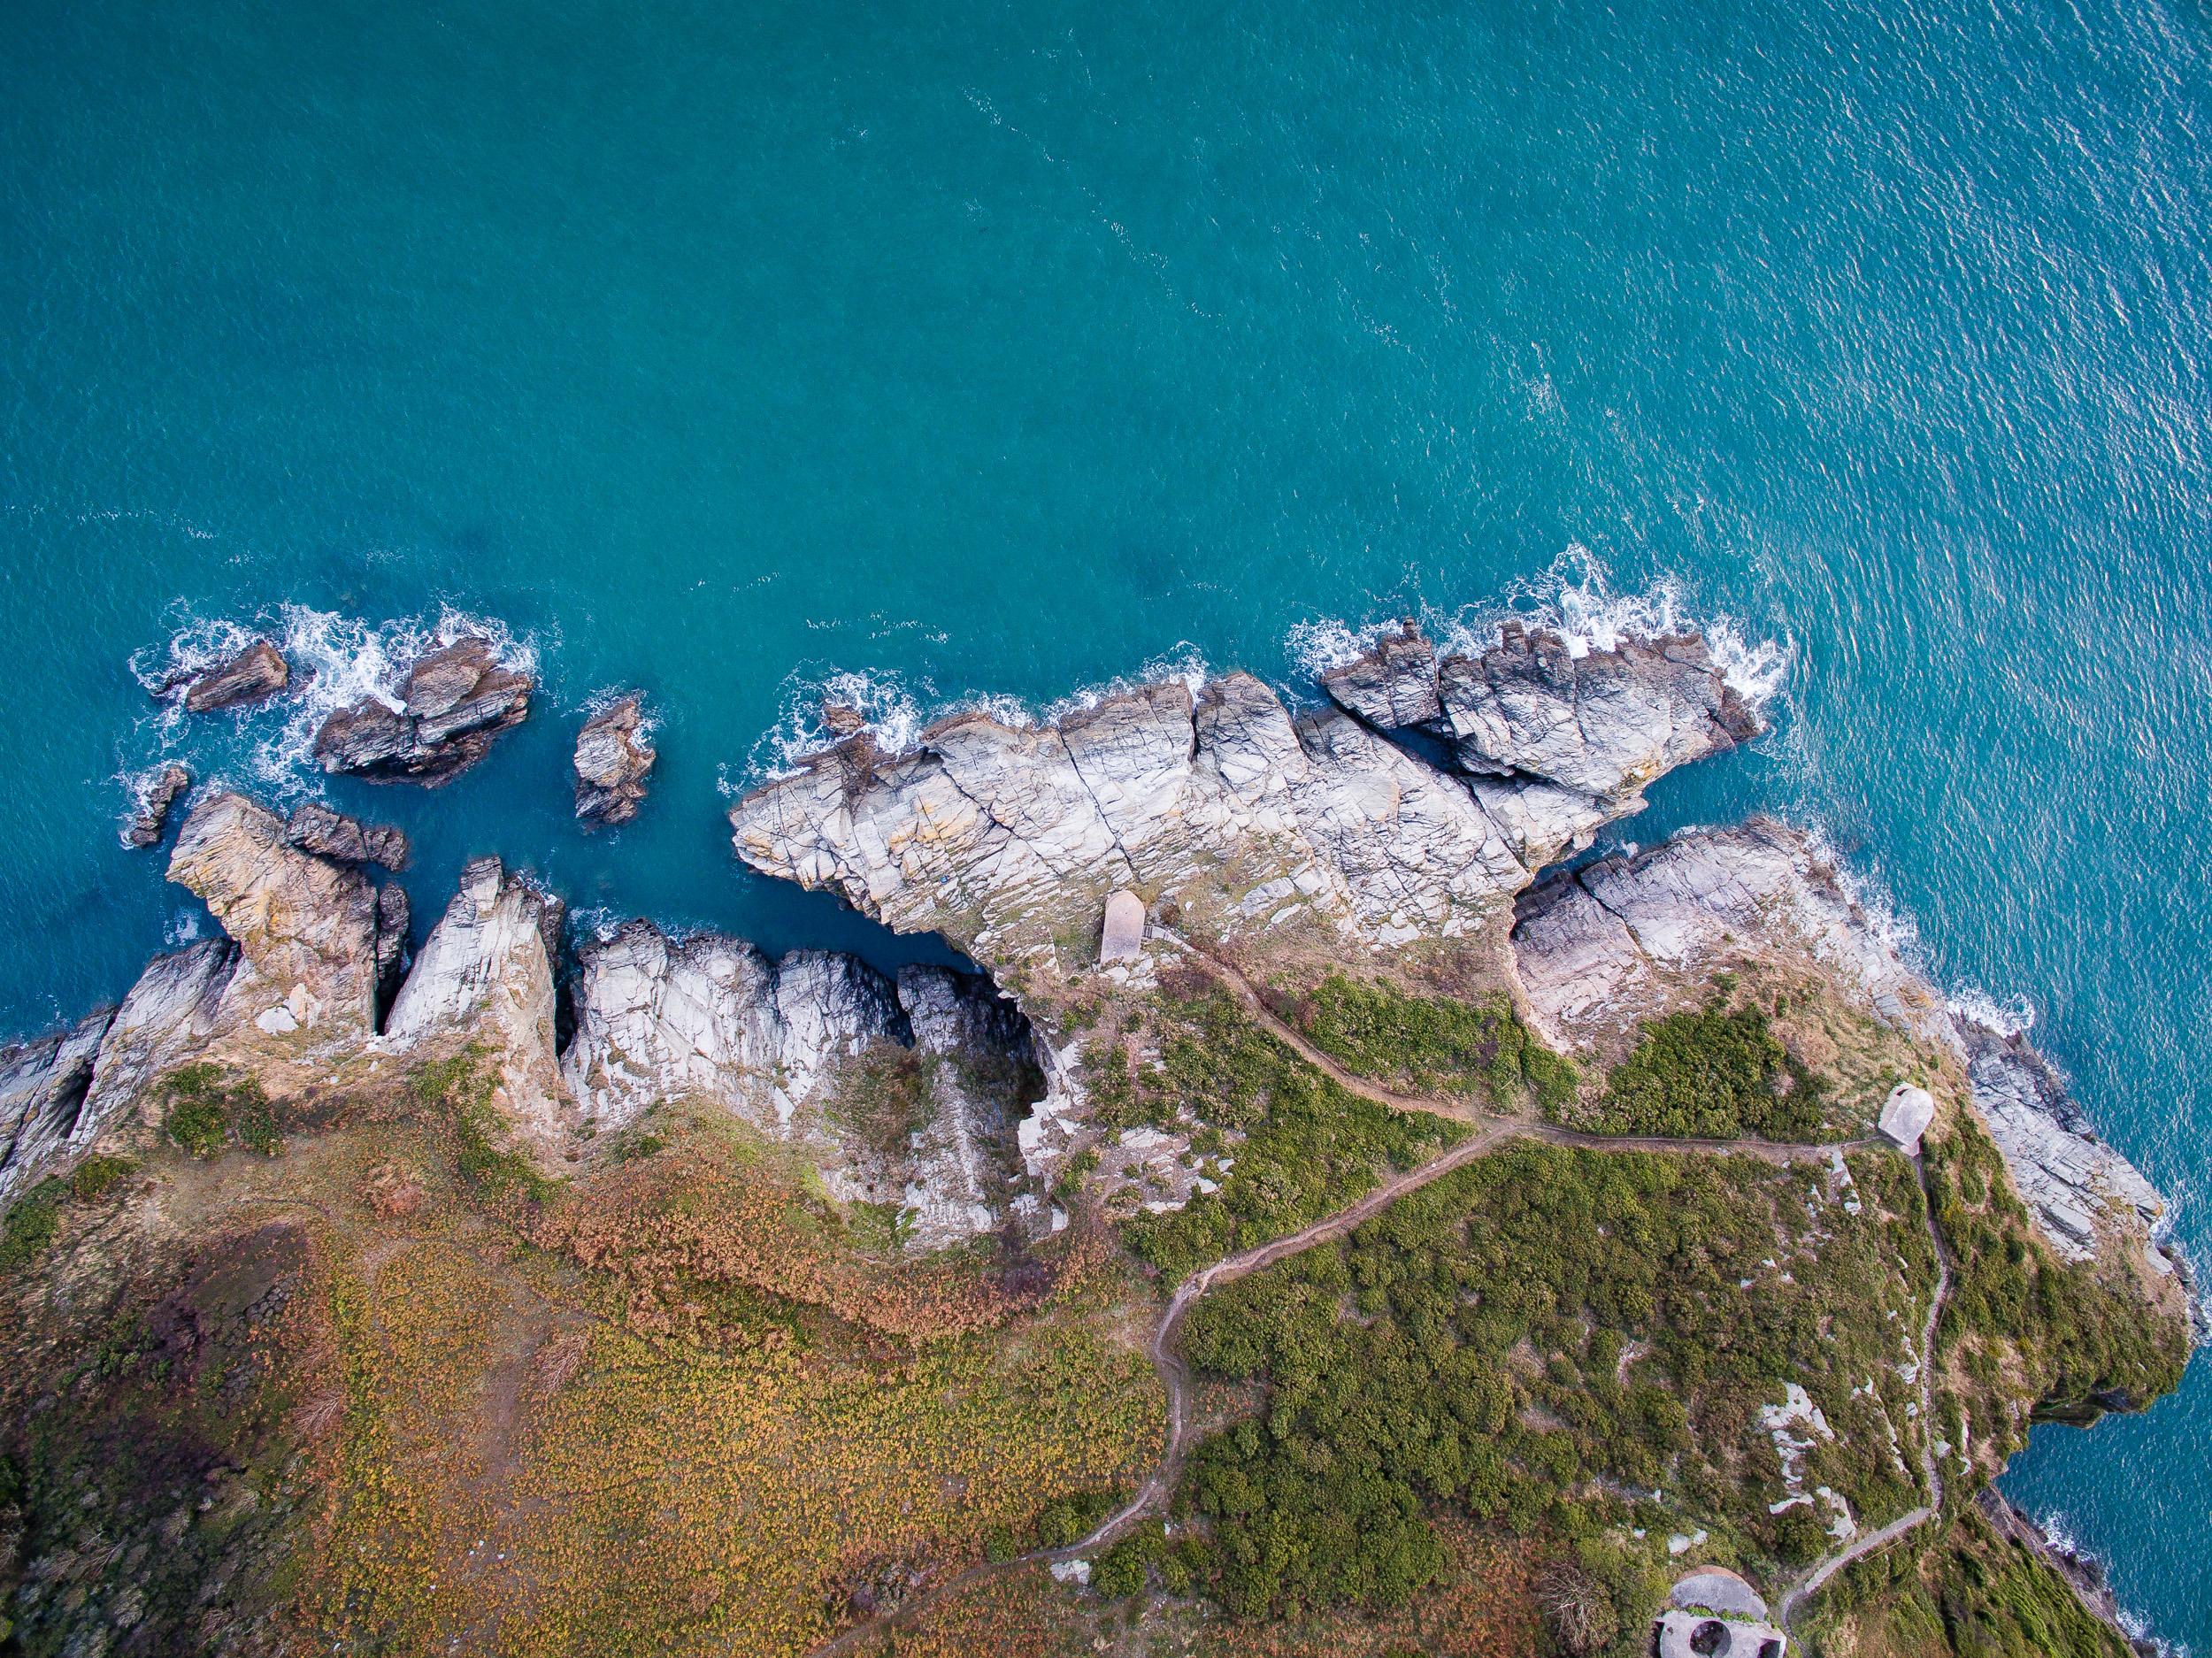 20161018-Froward Point Overhead-2.jpg